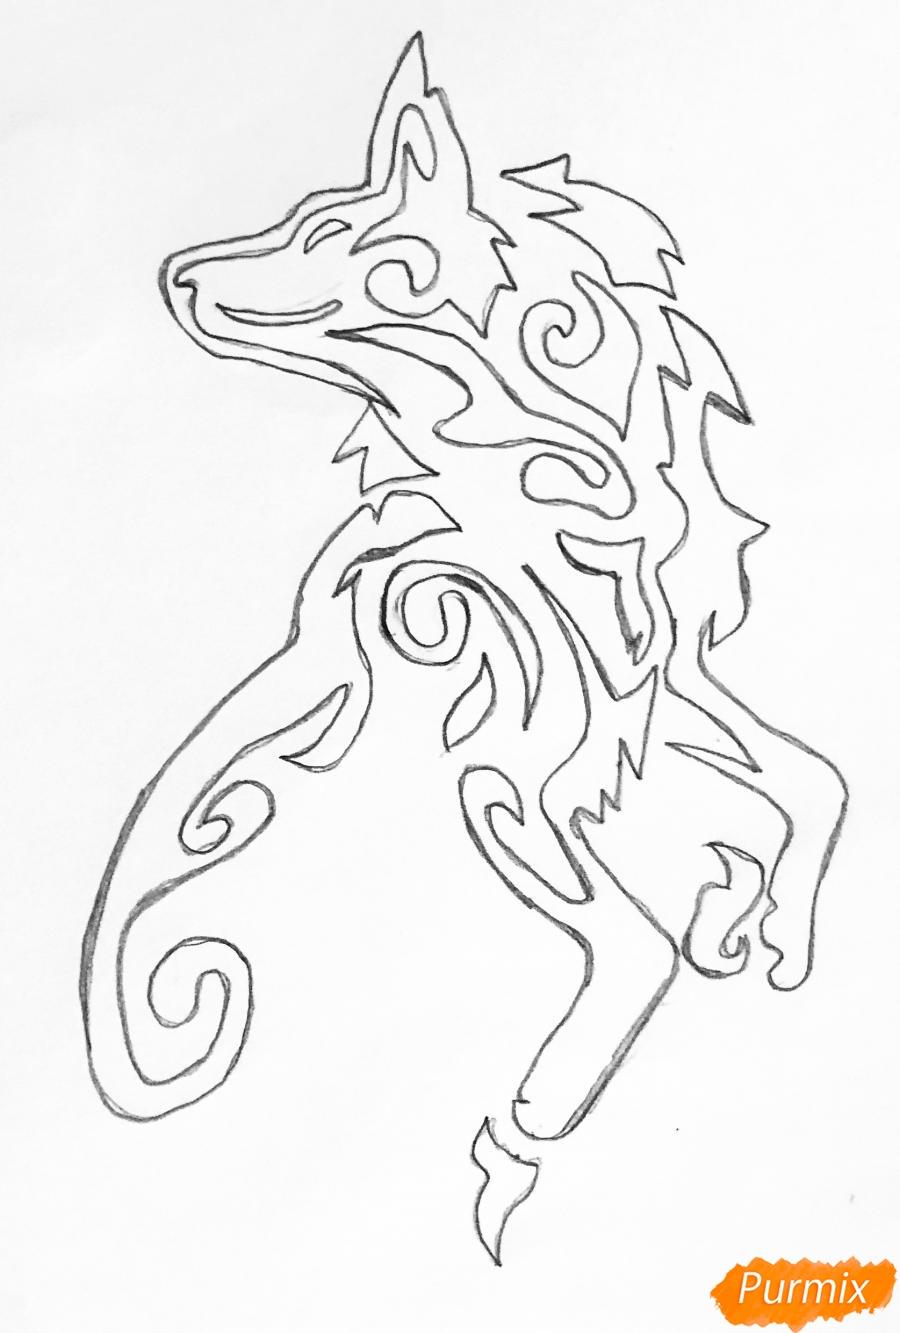 Рисуем лису в стиле тату - шаг 3